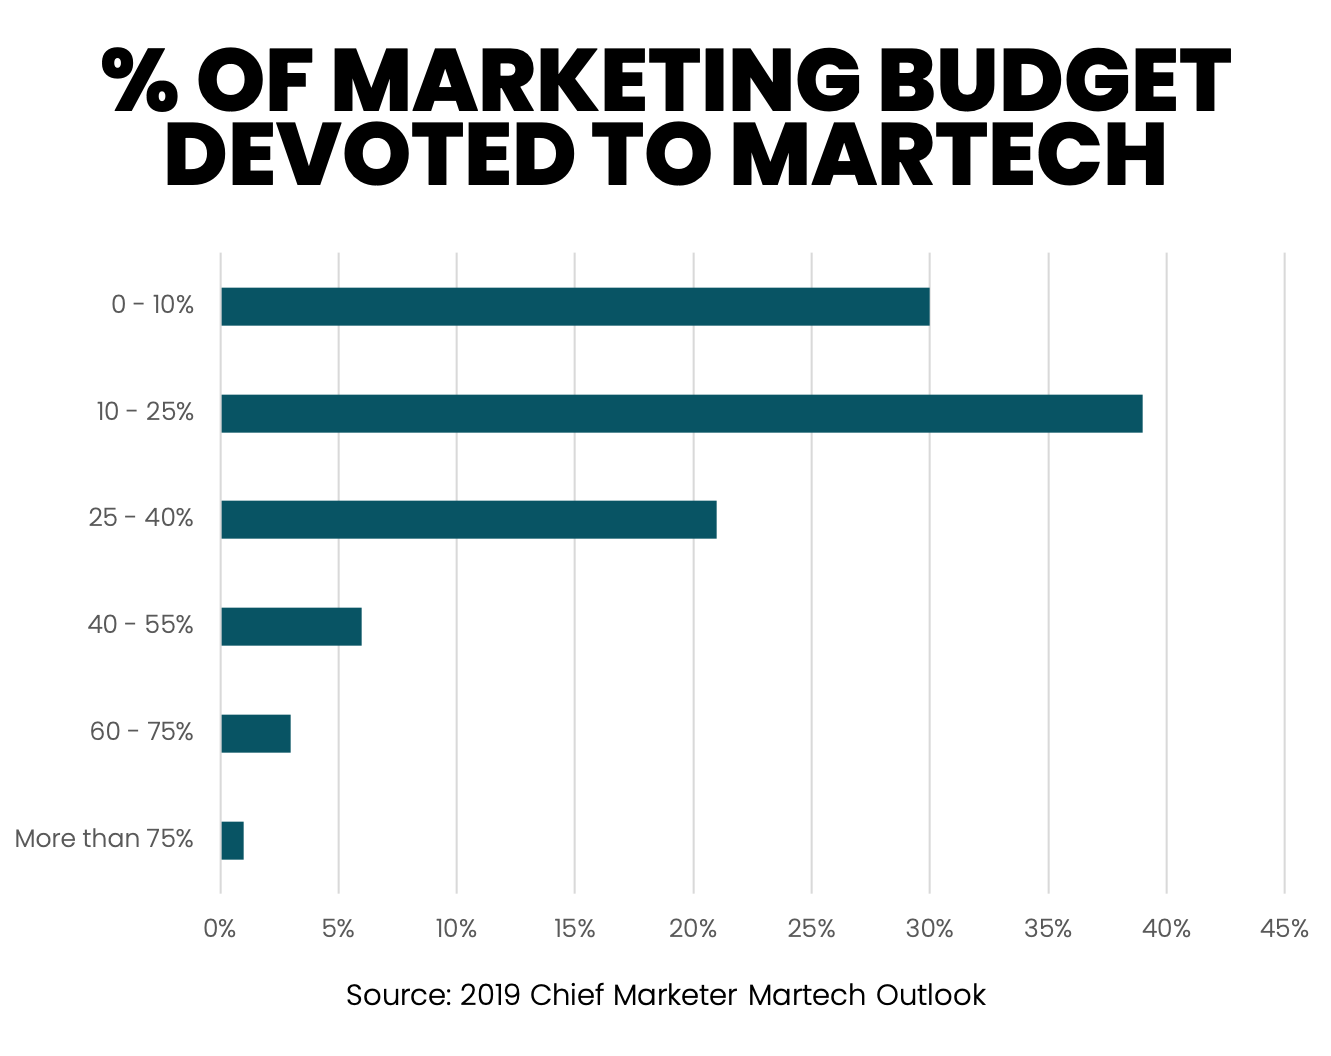 MarTech Budget as Percentage of Marketing Budget